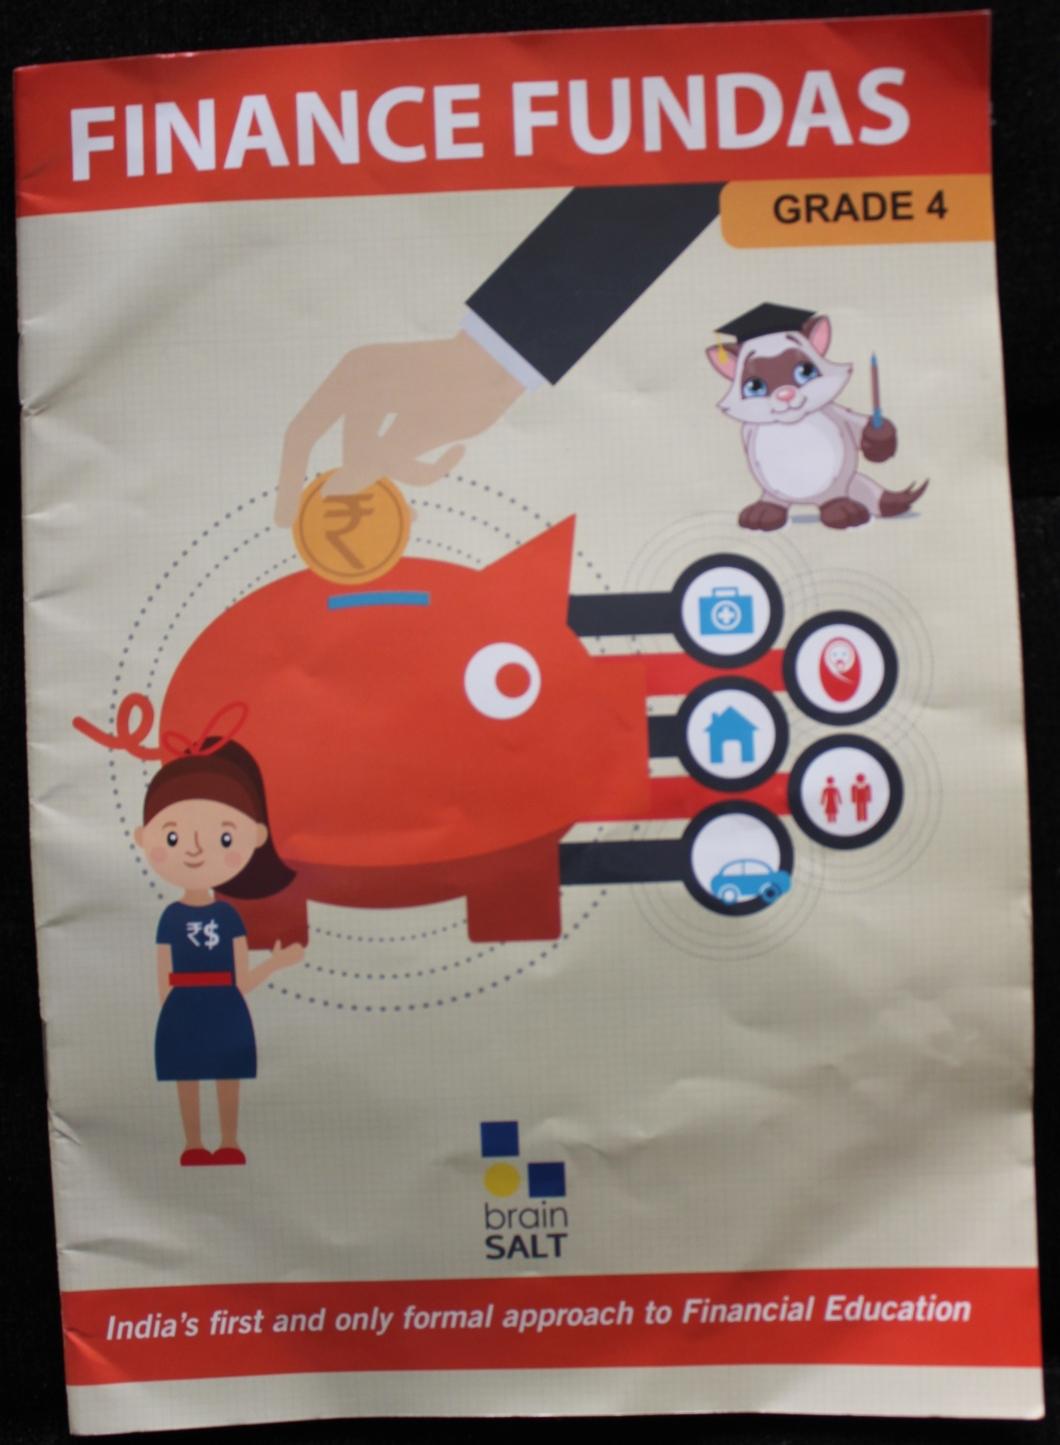 Educational Book - FINANCE FUNDAS by Brainsalt Education (Book Review in mirandavoice.com)